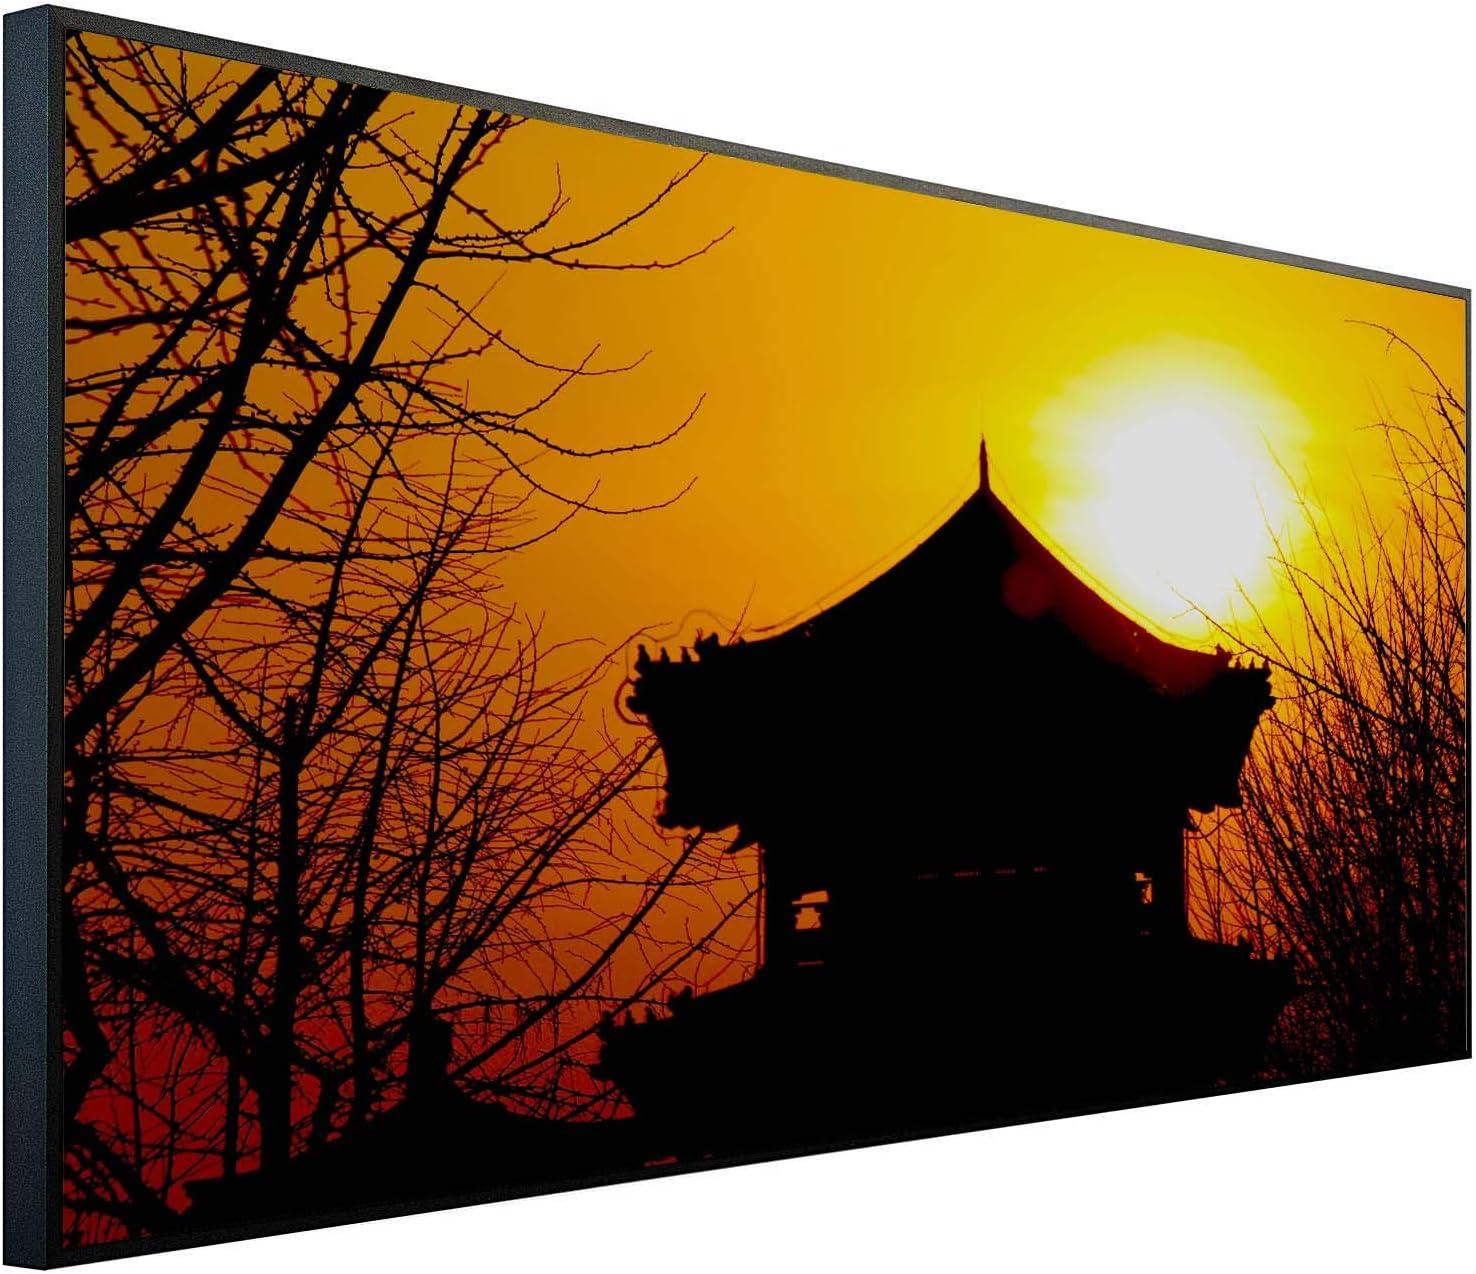 Ecowelle 350-1200 Watt Infrared Heating Panel Heating HD Print Picture 34